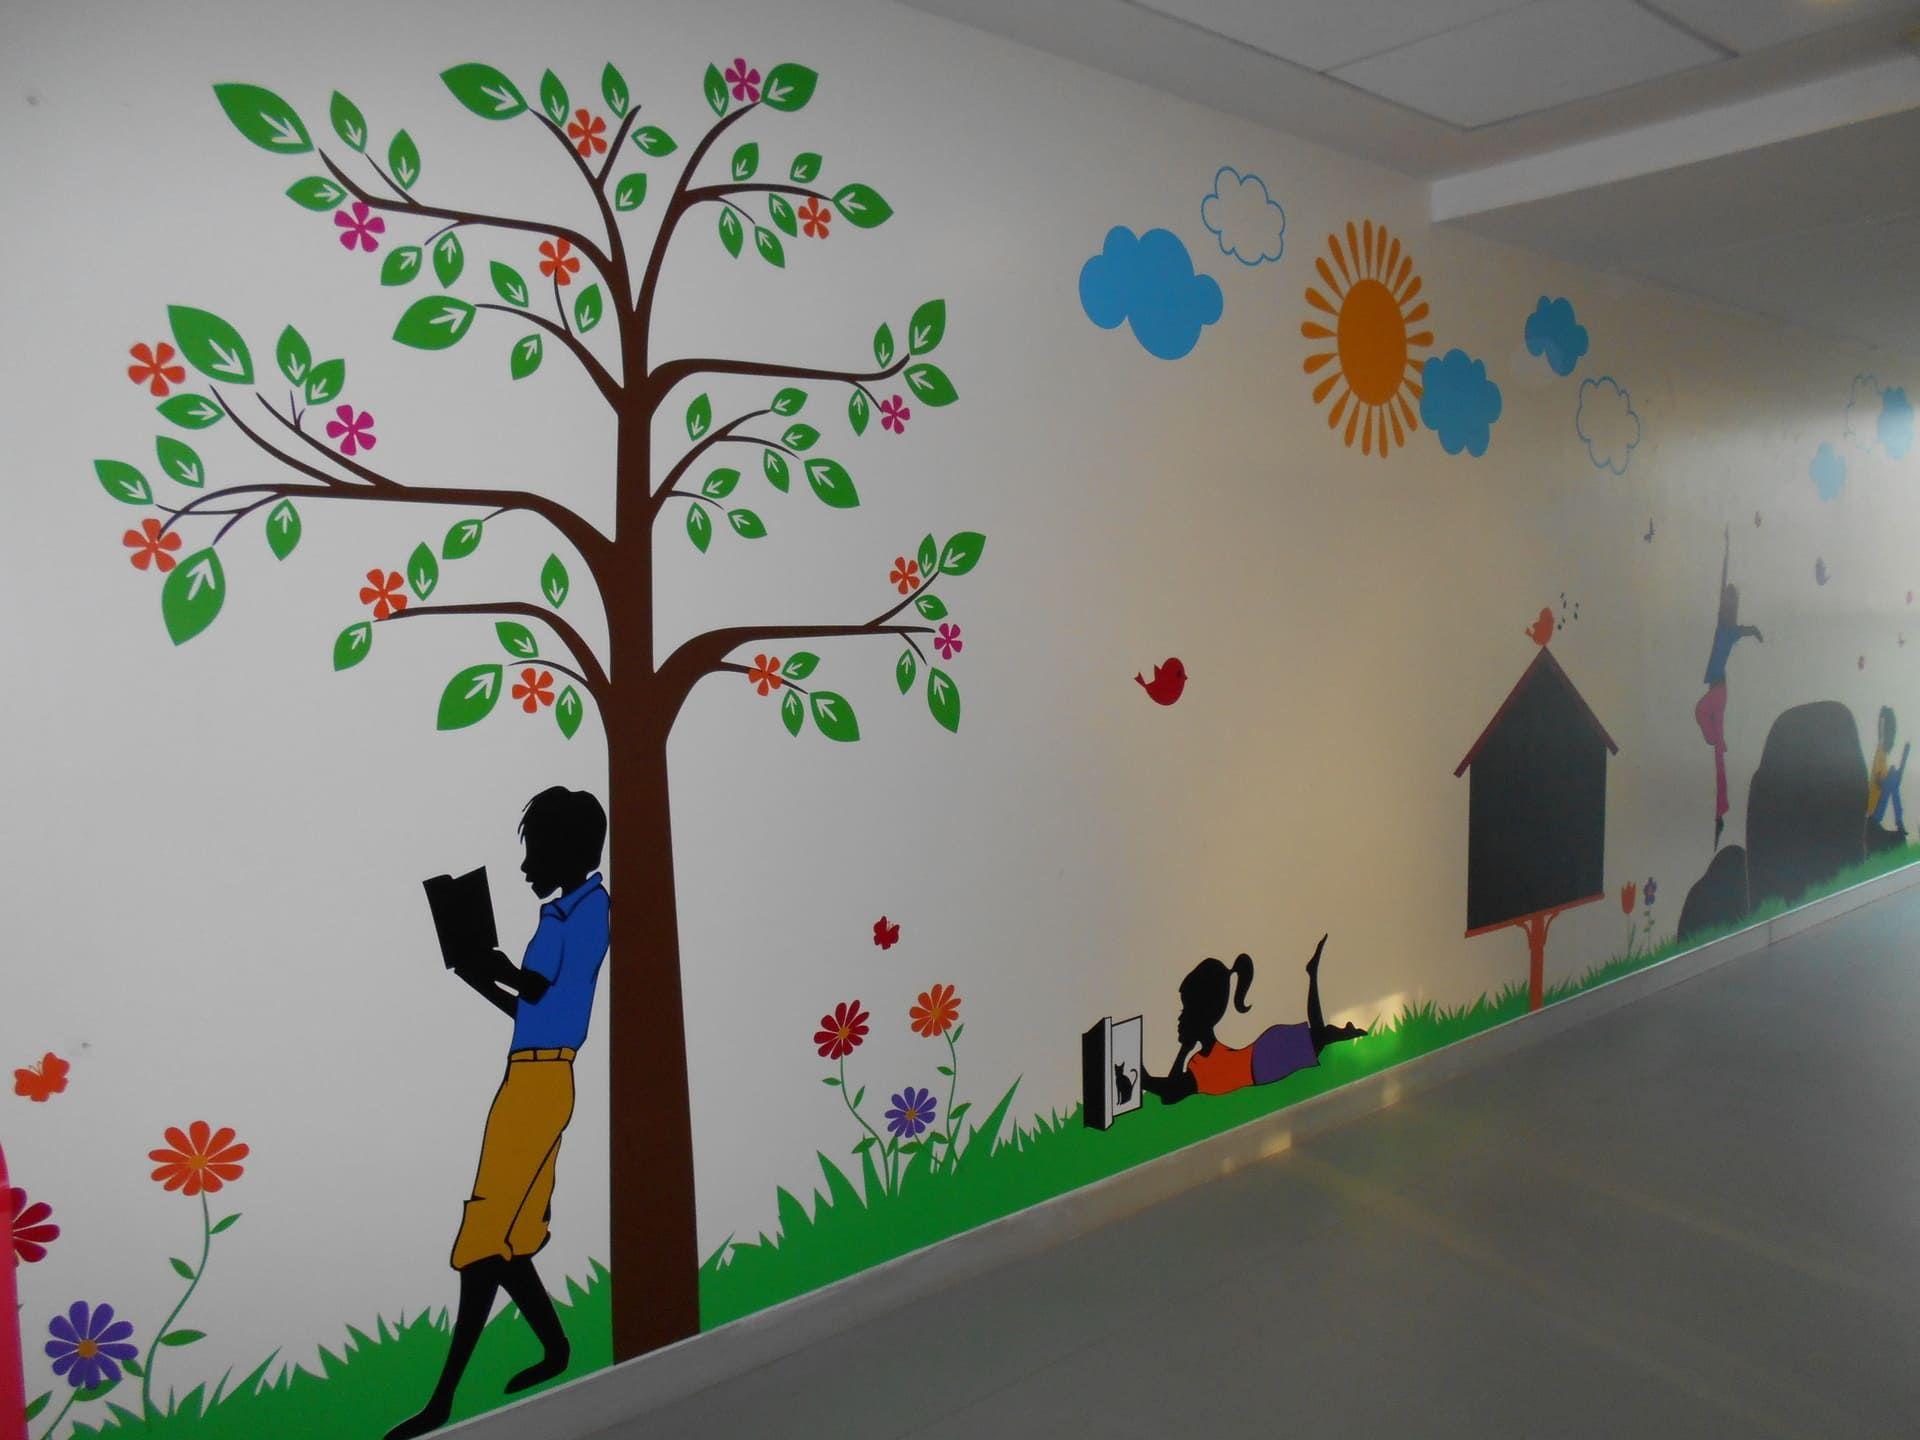 Mockingbird Studios Mumbai Customized Wall Graphics Decals Wallpapers Canvas Schools 2 Wall Graphics Graphic School